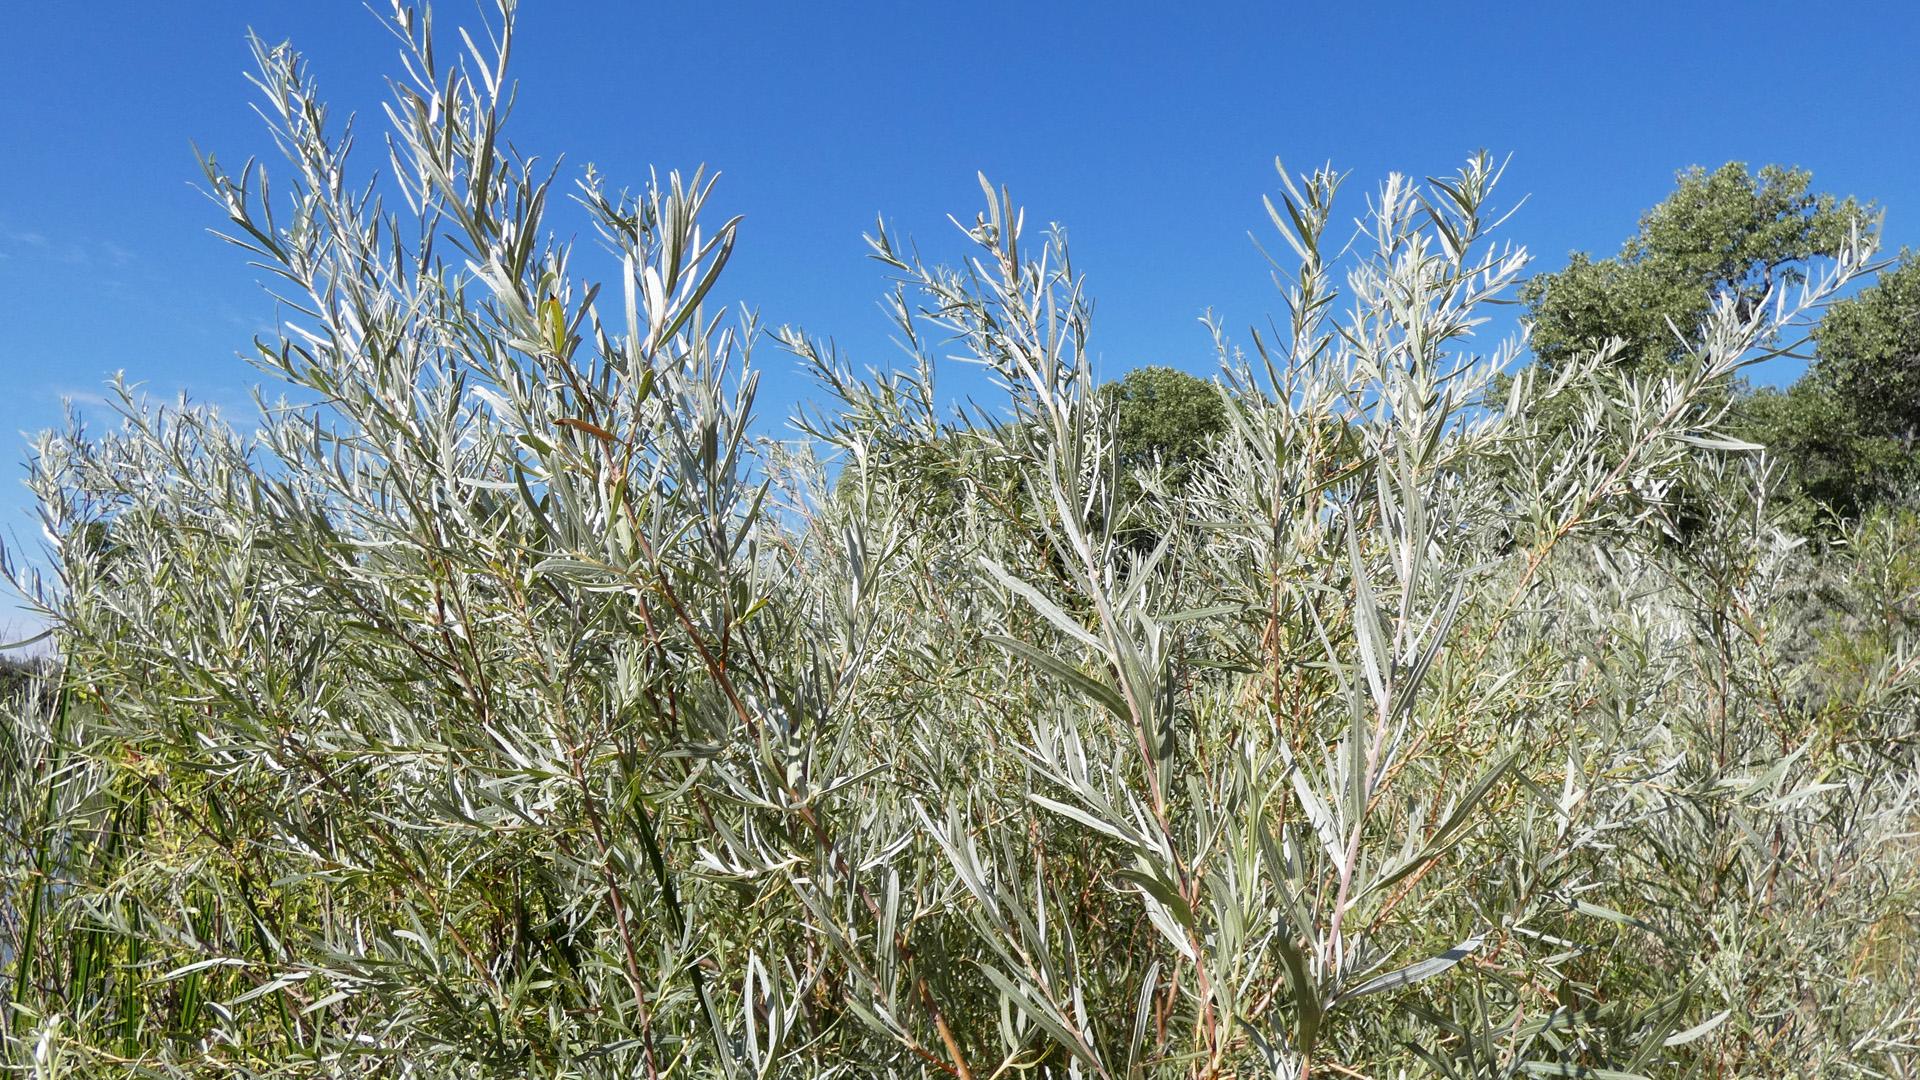 Narrow-leaf willow (I think), Rio Grande Bosque, Albuquerque, August 2020